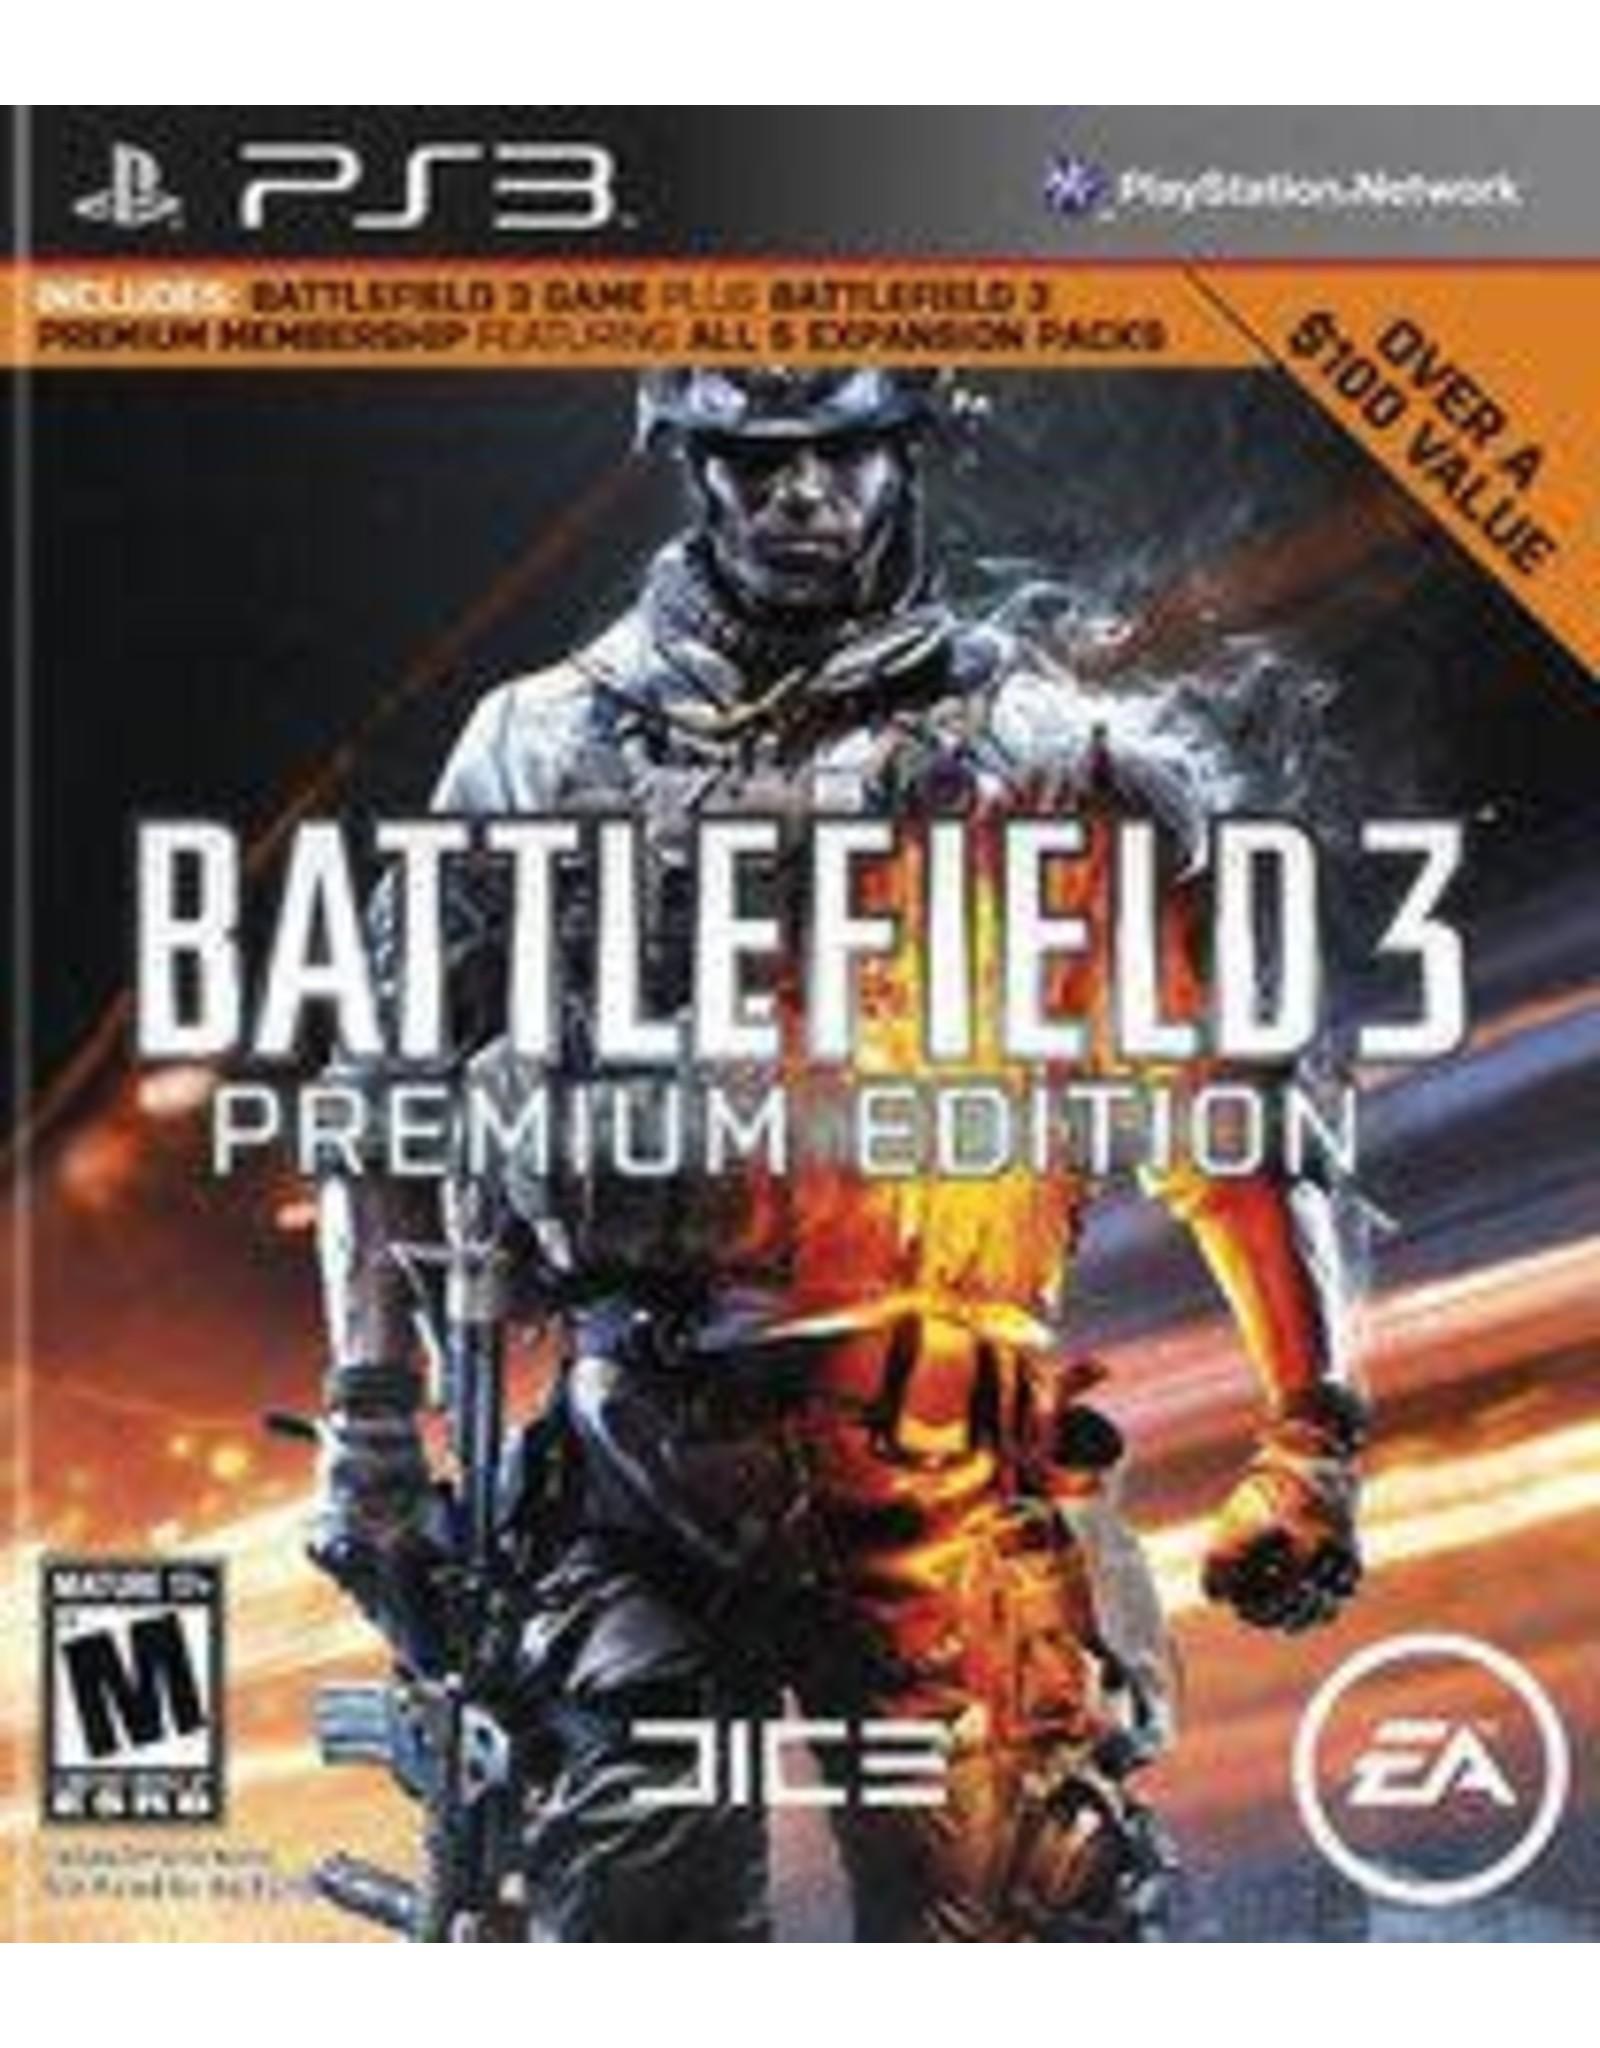 Playstation 3 Battlefield 3 Premium Edition (No DLC)